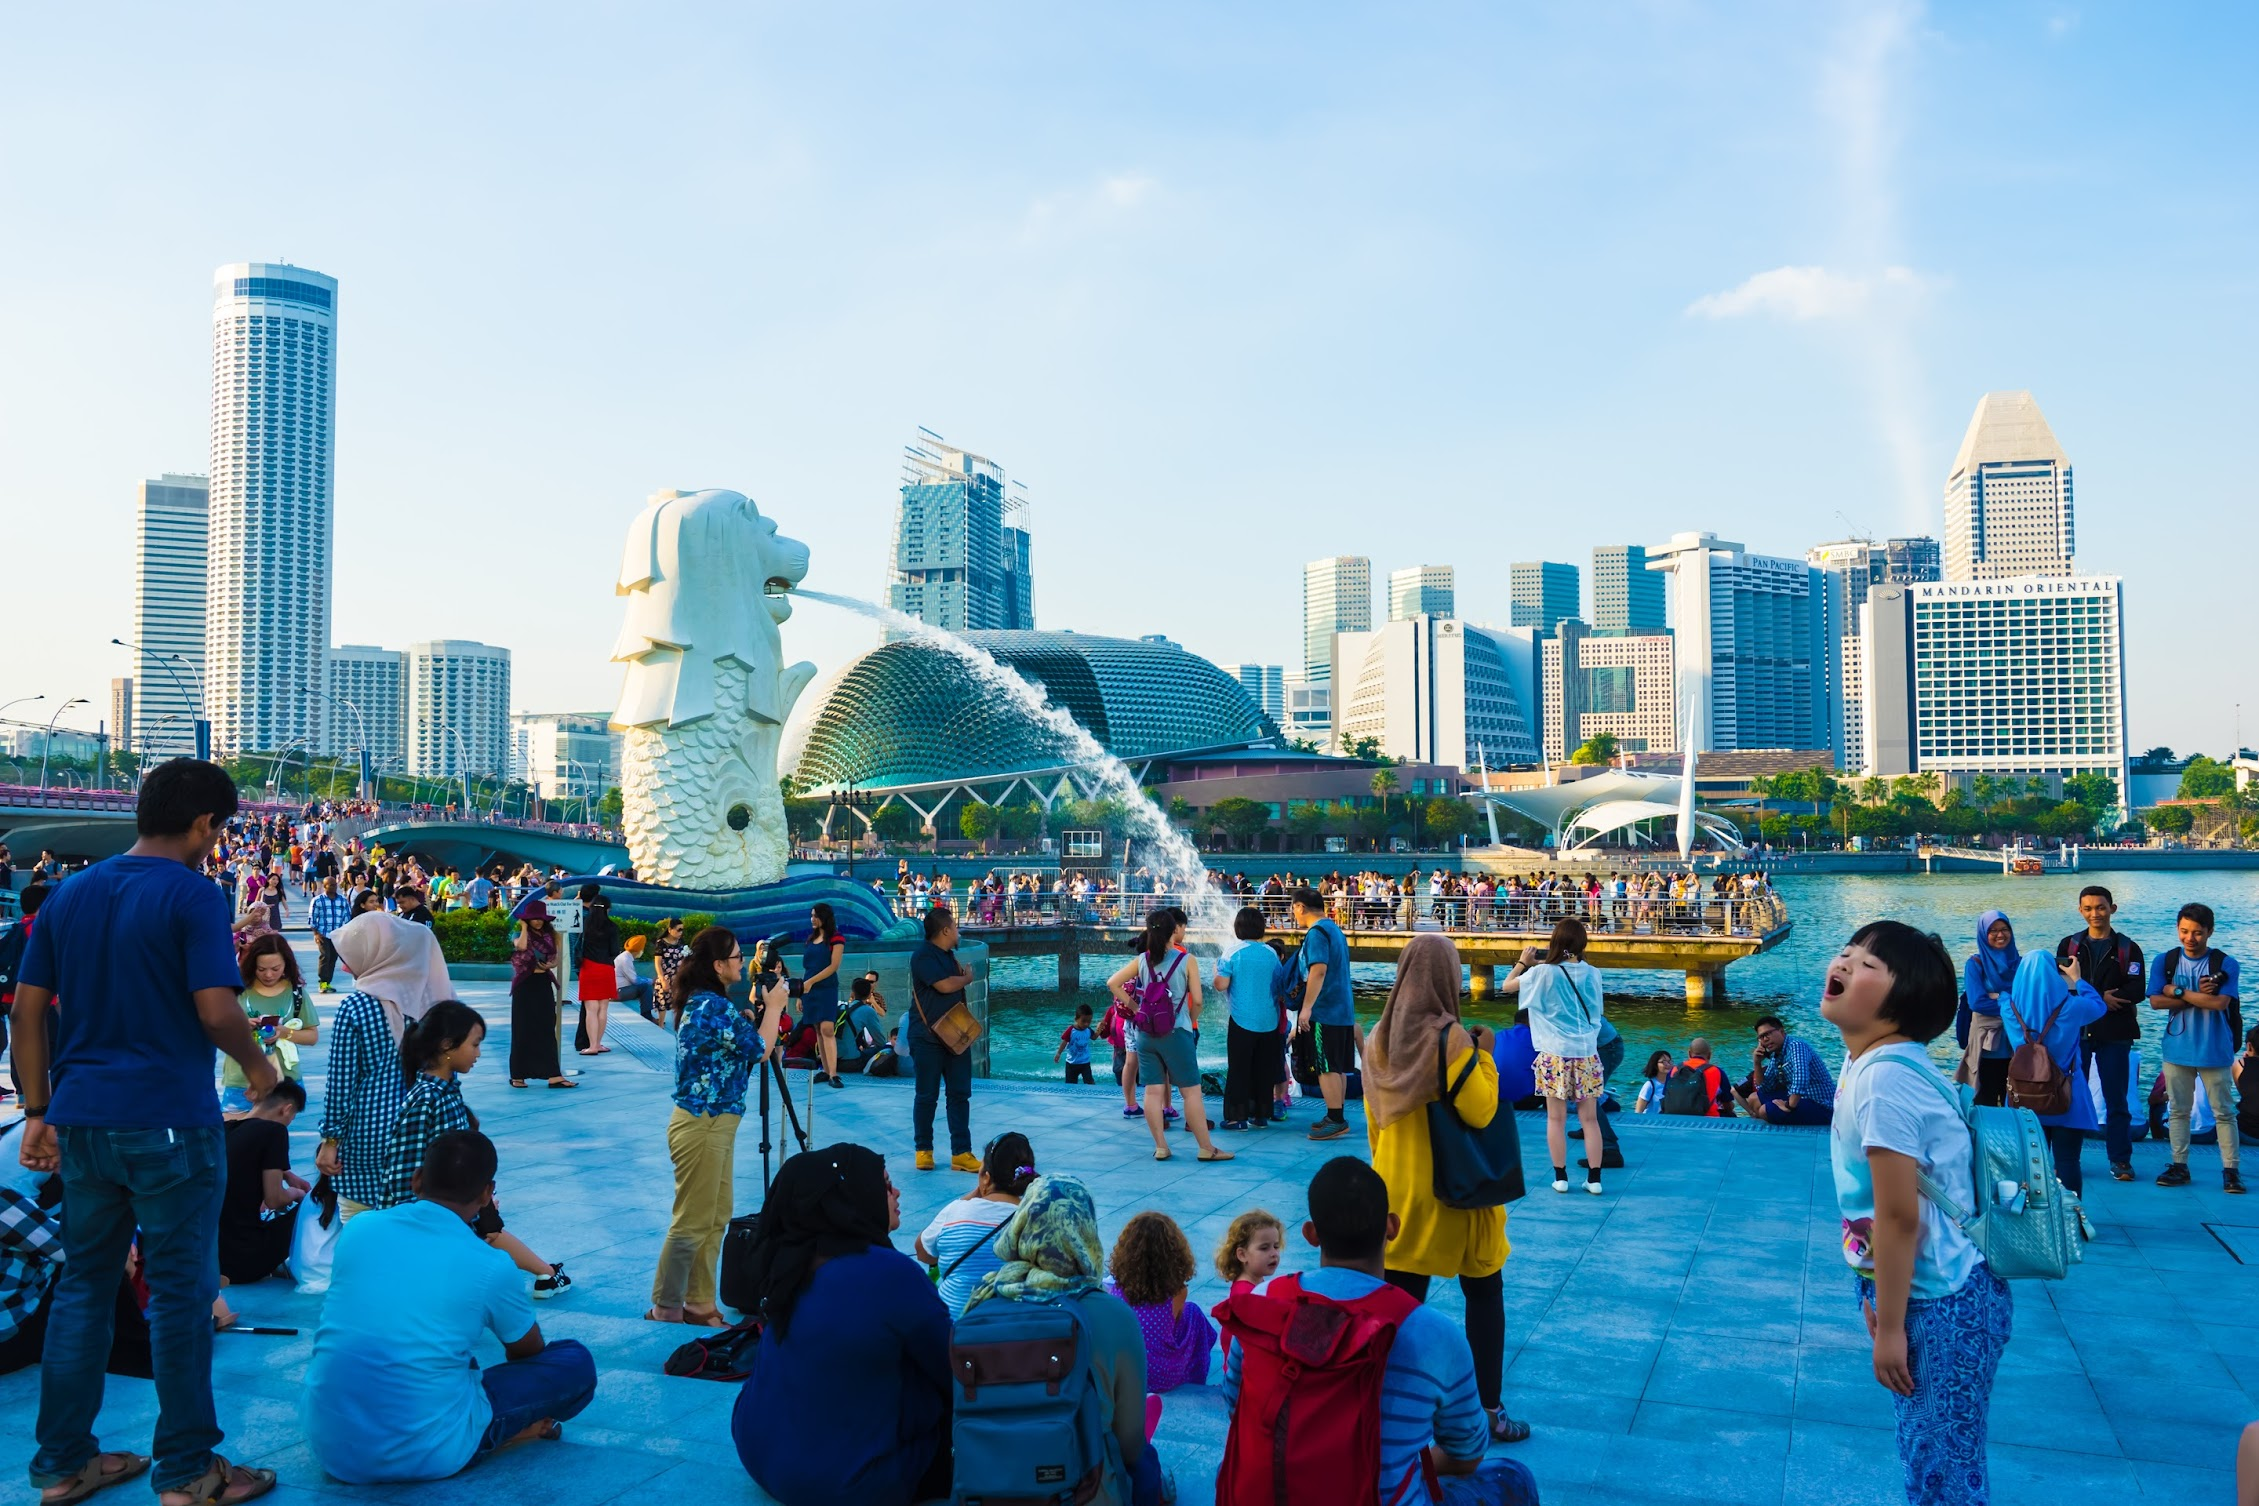 Singapore Merlion Park3